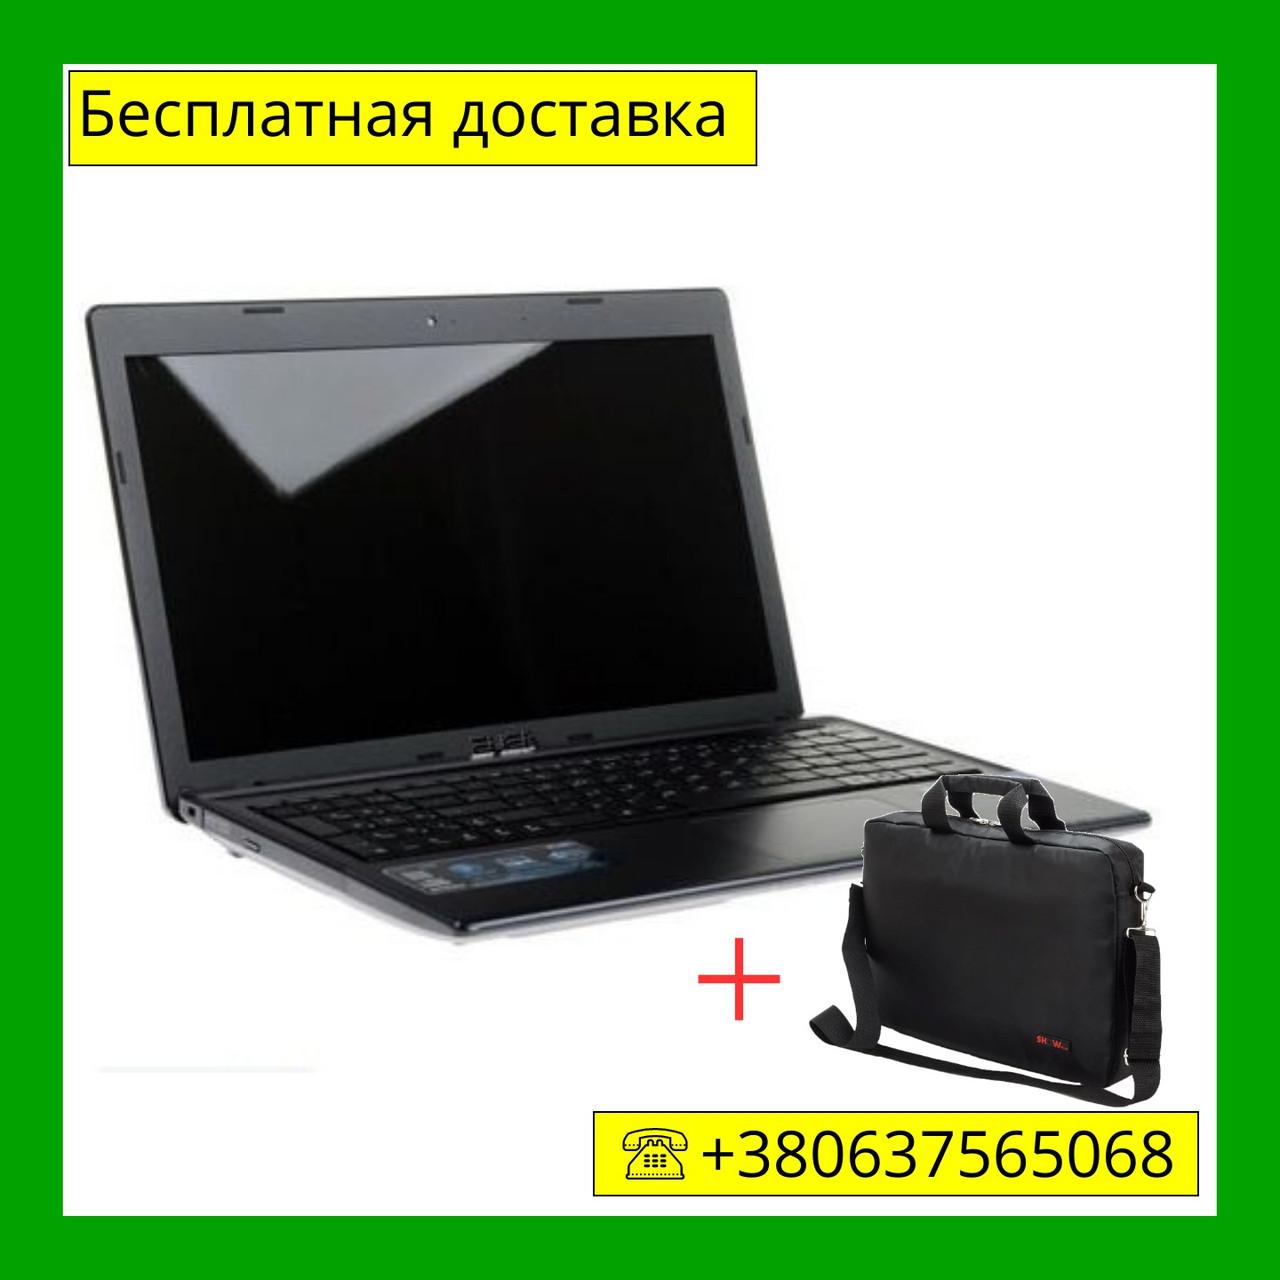 Б/У ноутбук Asus X55V  15,6 \ i3-2338M \ 8 GB \ 500 GB \ GeForce 610M \, фото 1